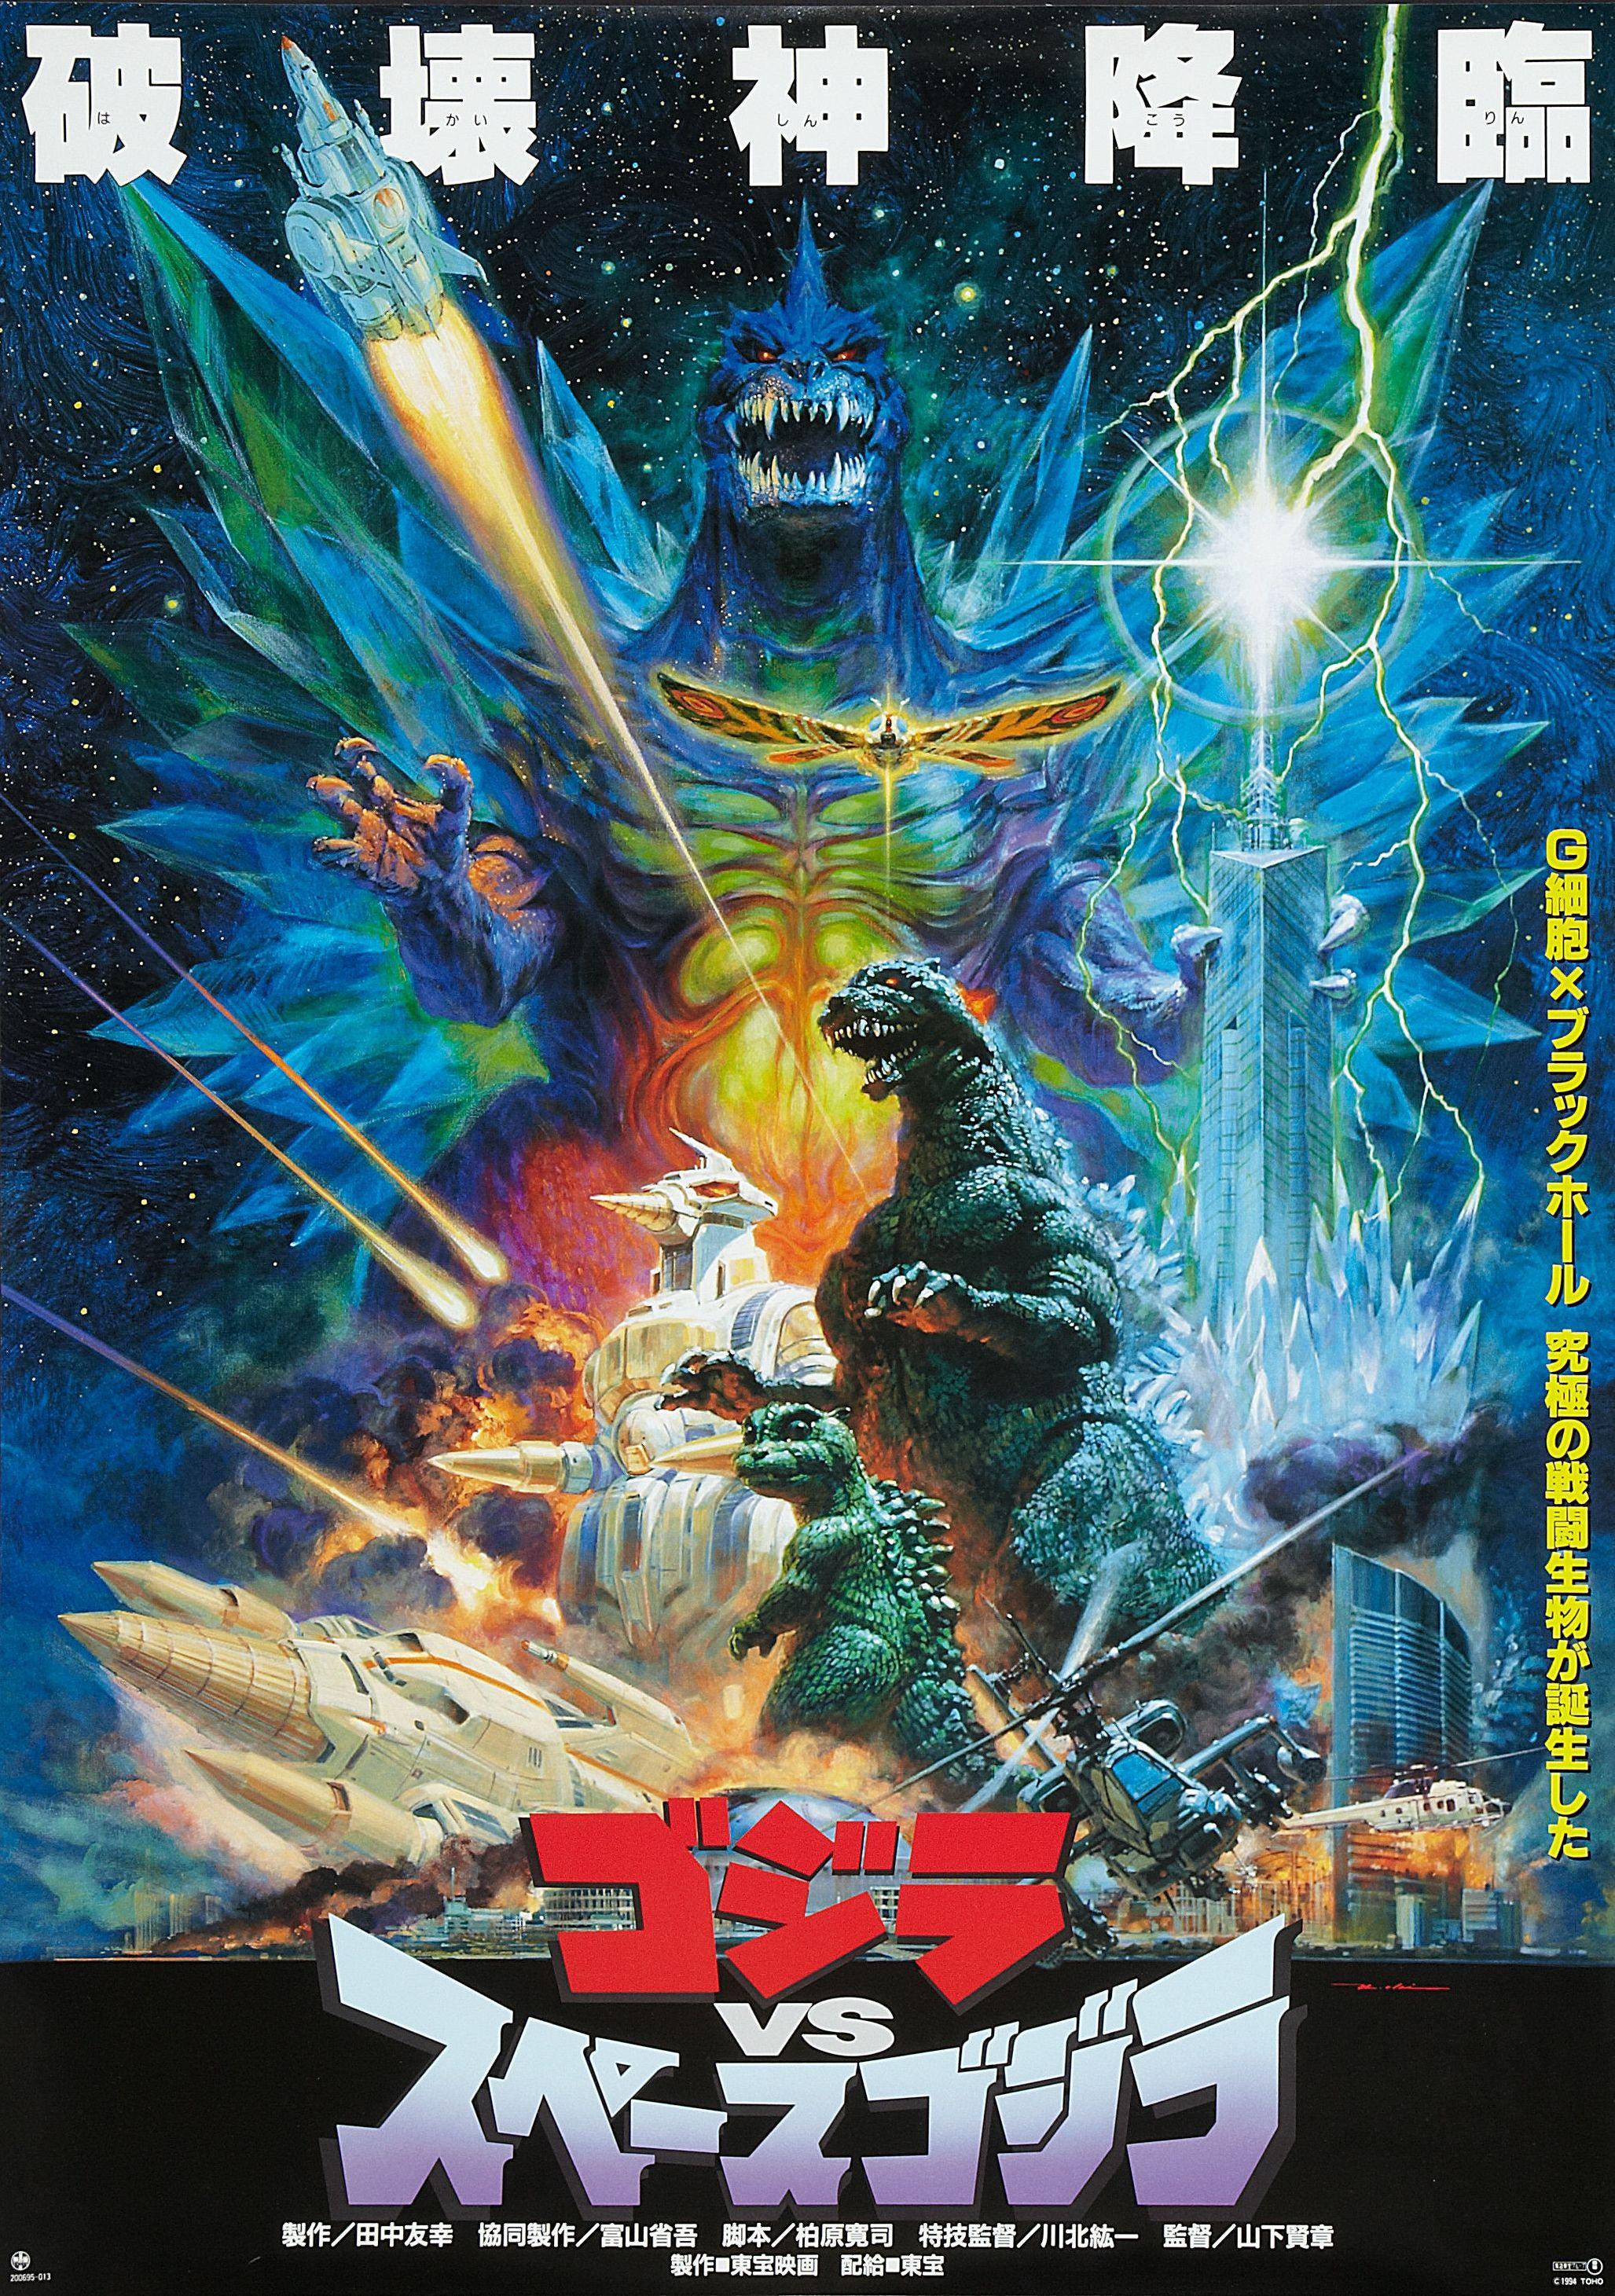 Godzilla vs SpaceGodzilla (1994) | SKREEONK!